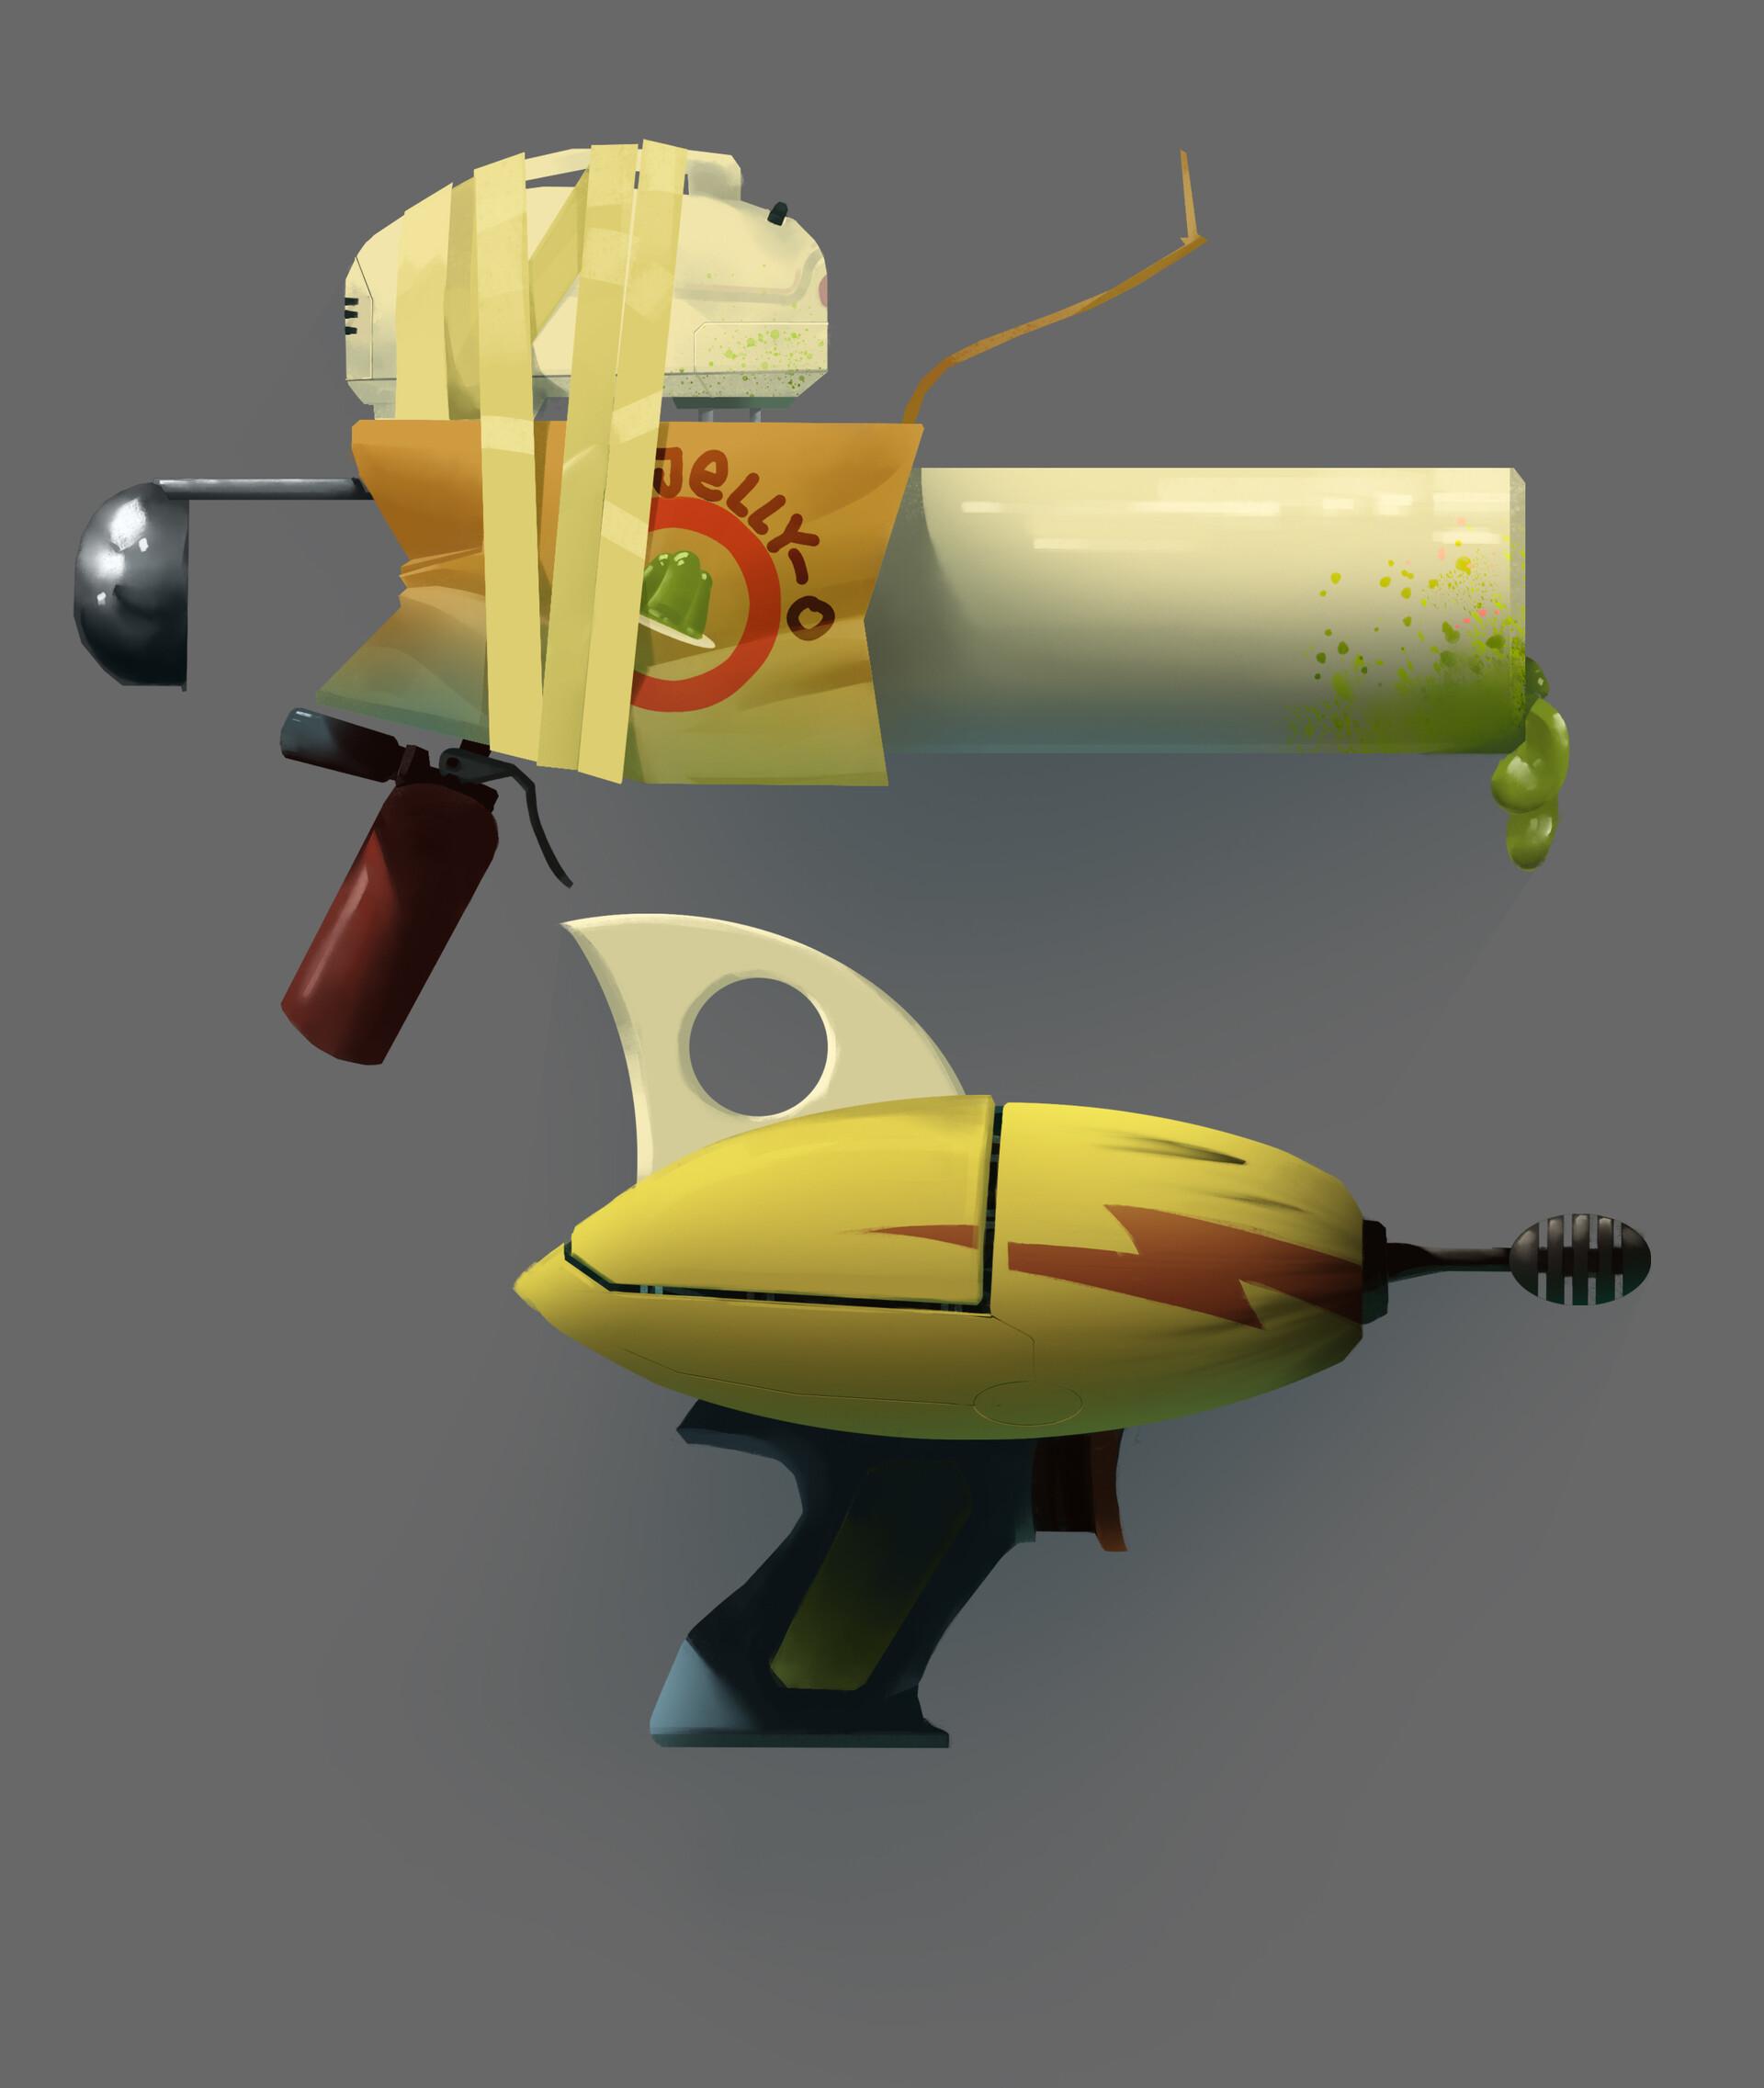 ArtStation - Weapons, Zsigmond Lehel